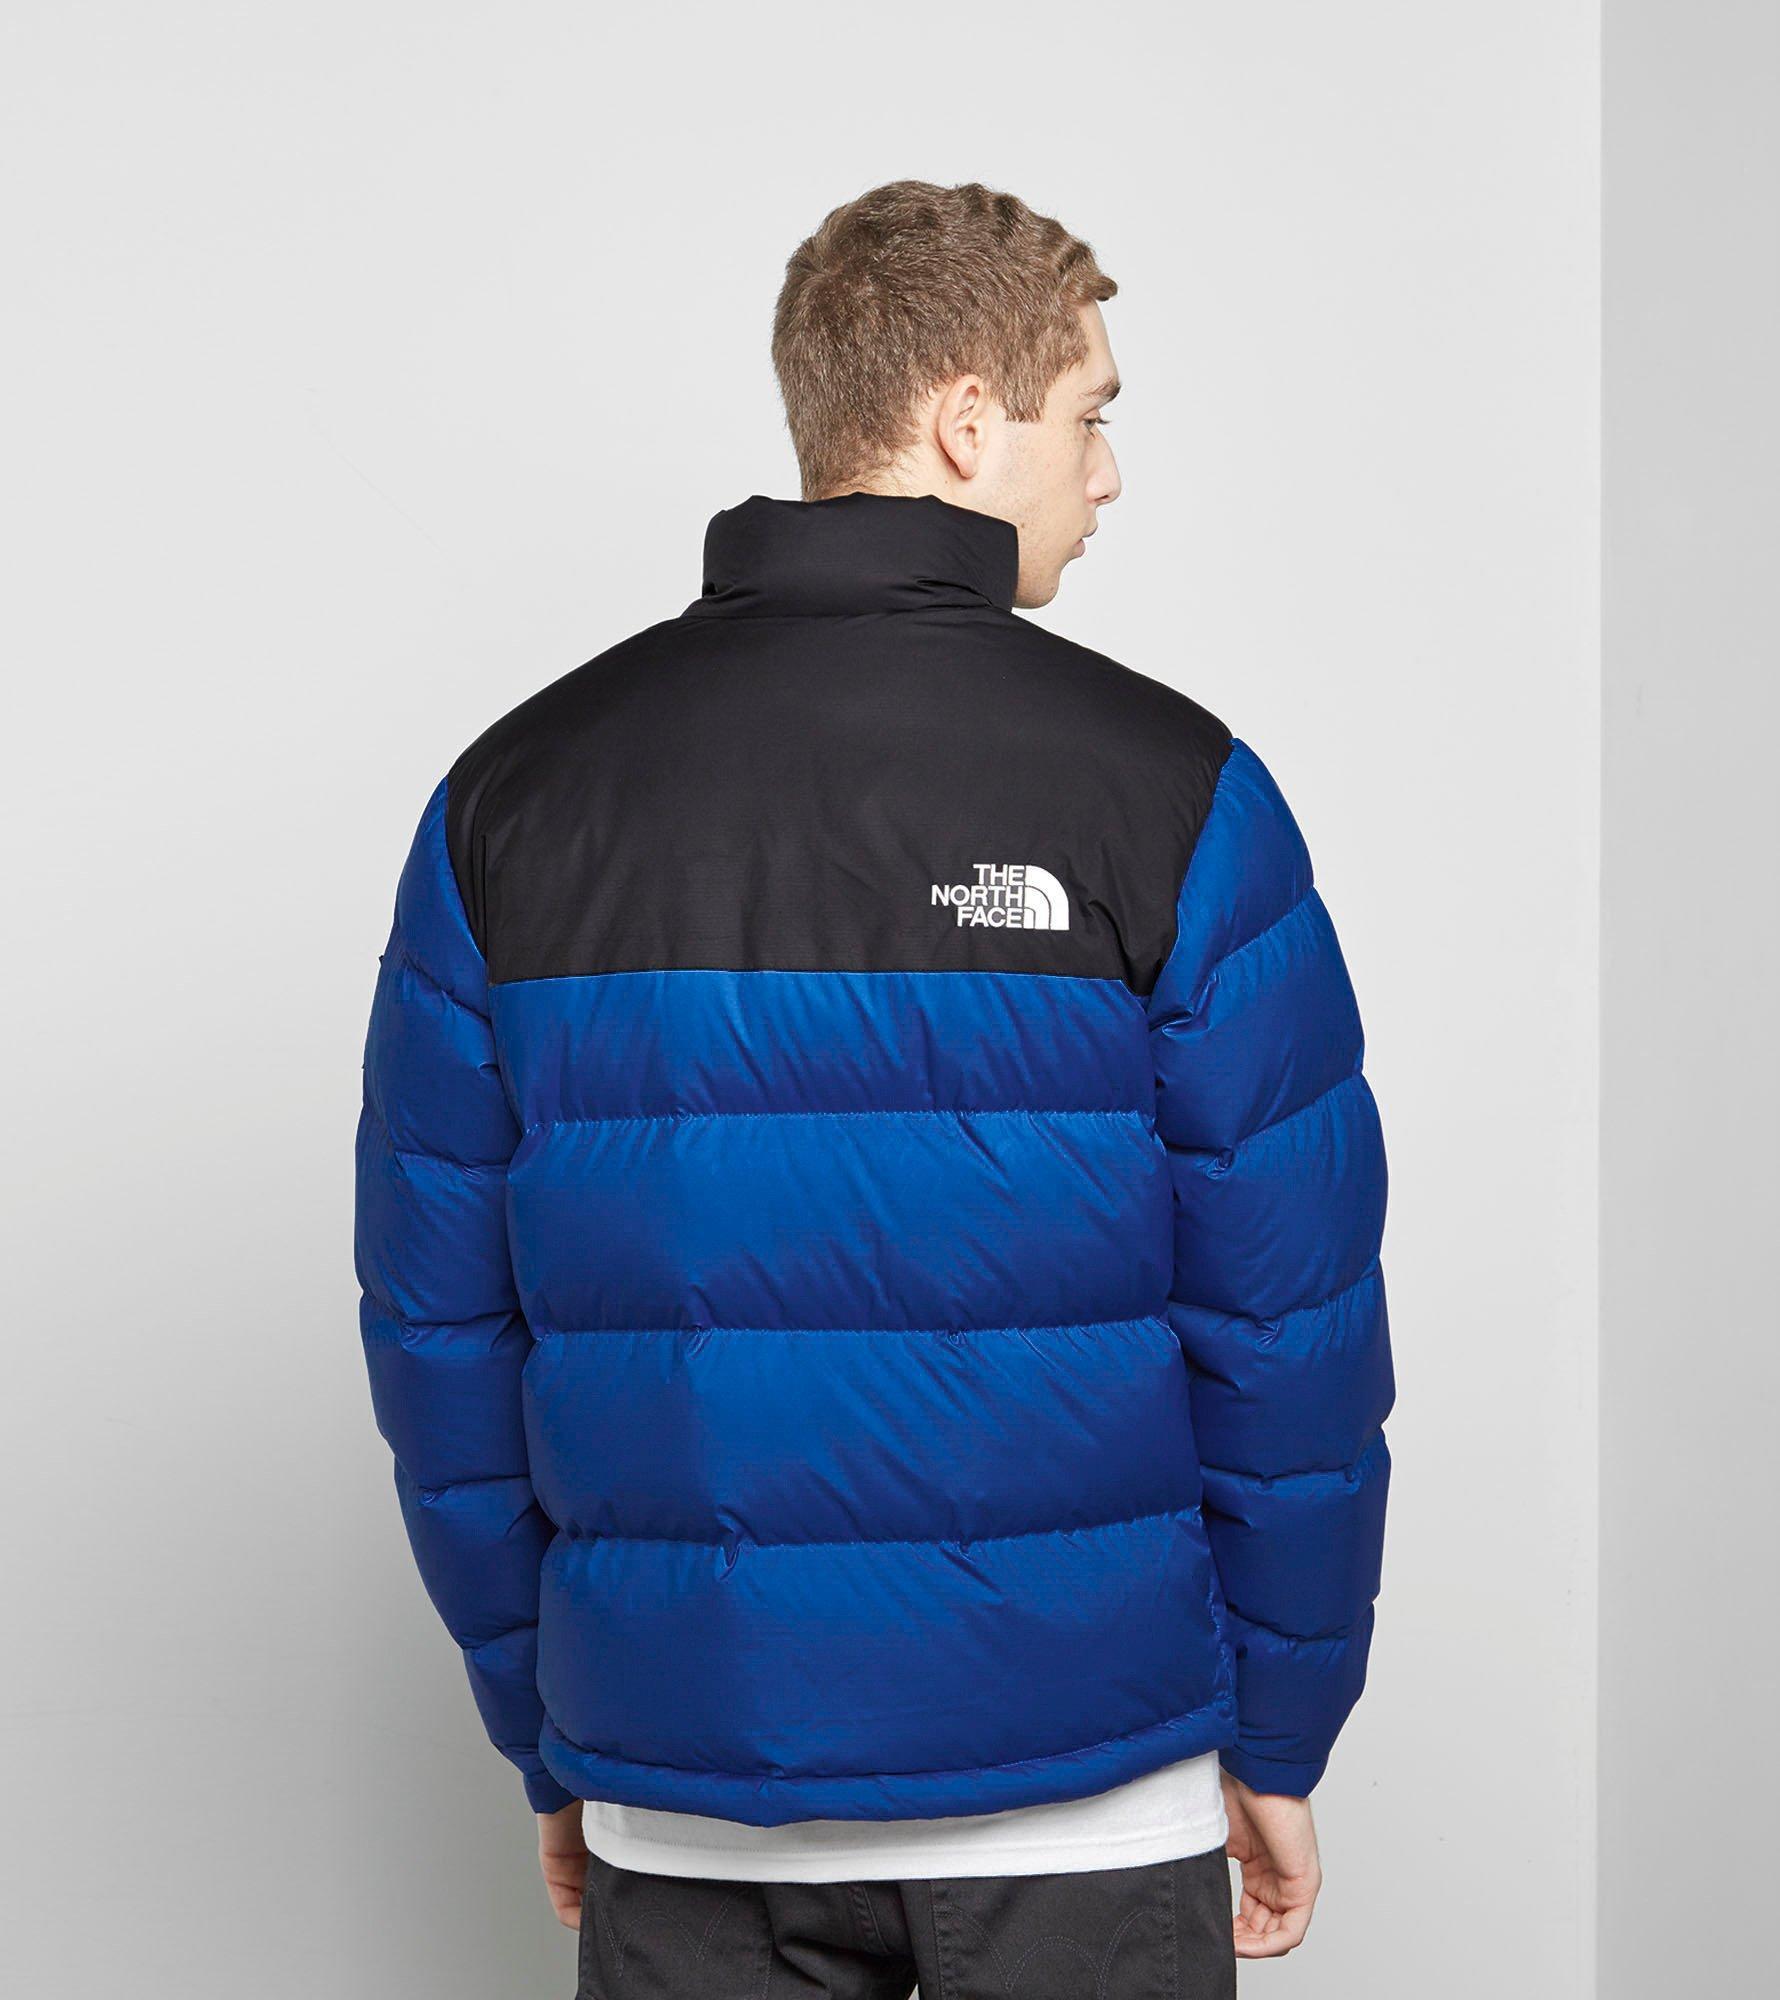 5b52775d3 The North Face Blue 1992 Nuptse Jacket for men